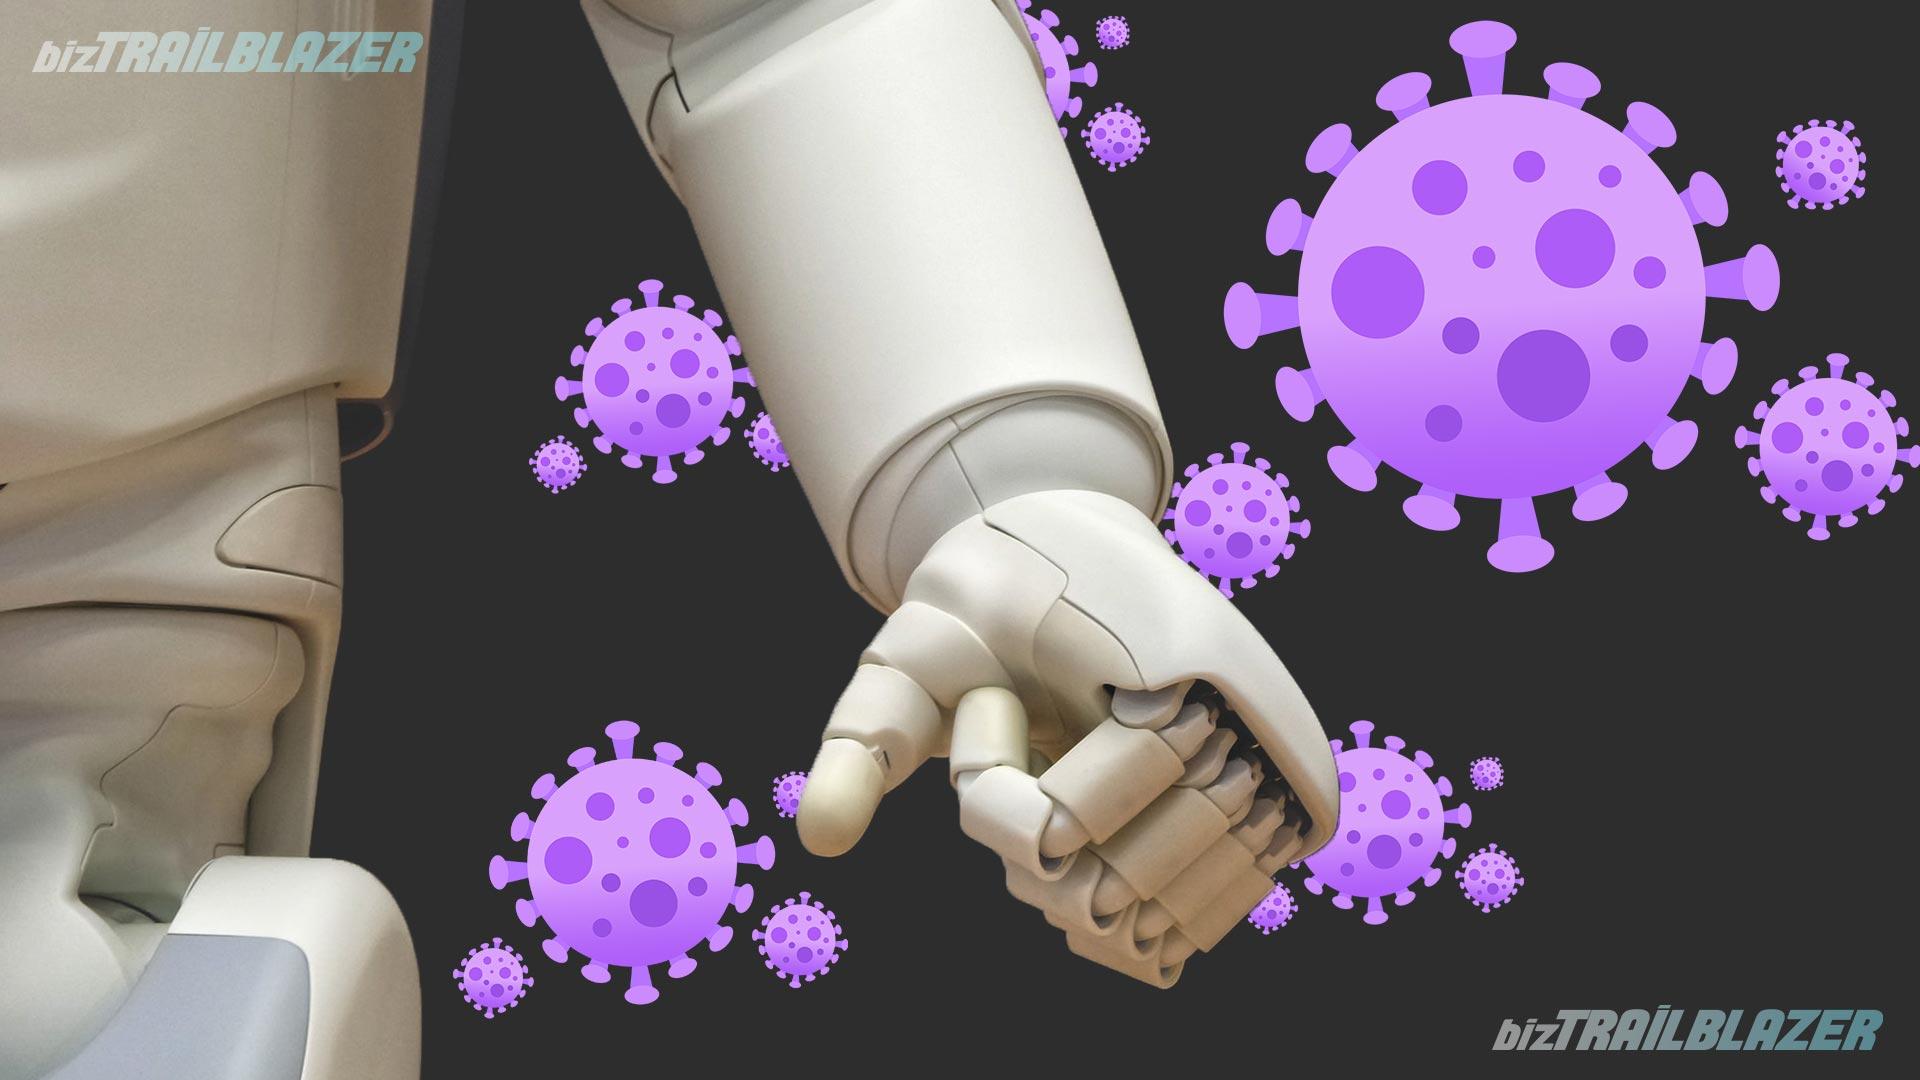 Artificial-Intelligence-The-Silent-Frontline-Worker-BizTrailBlazer-Blog